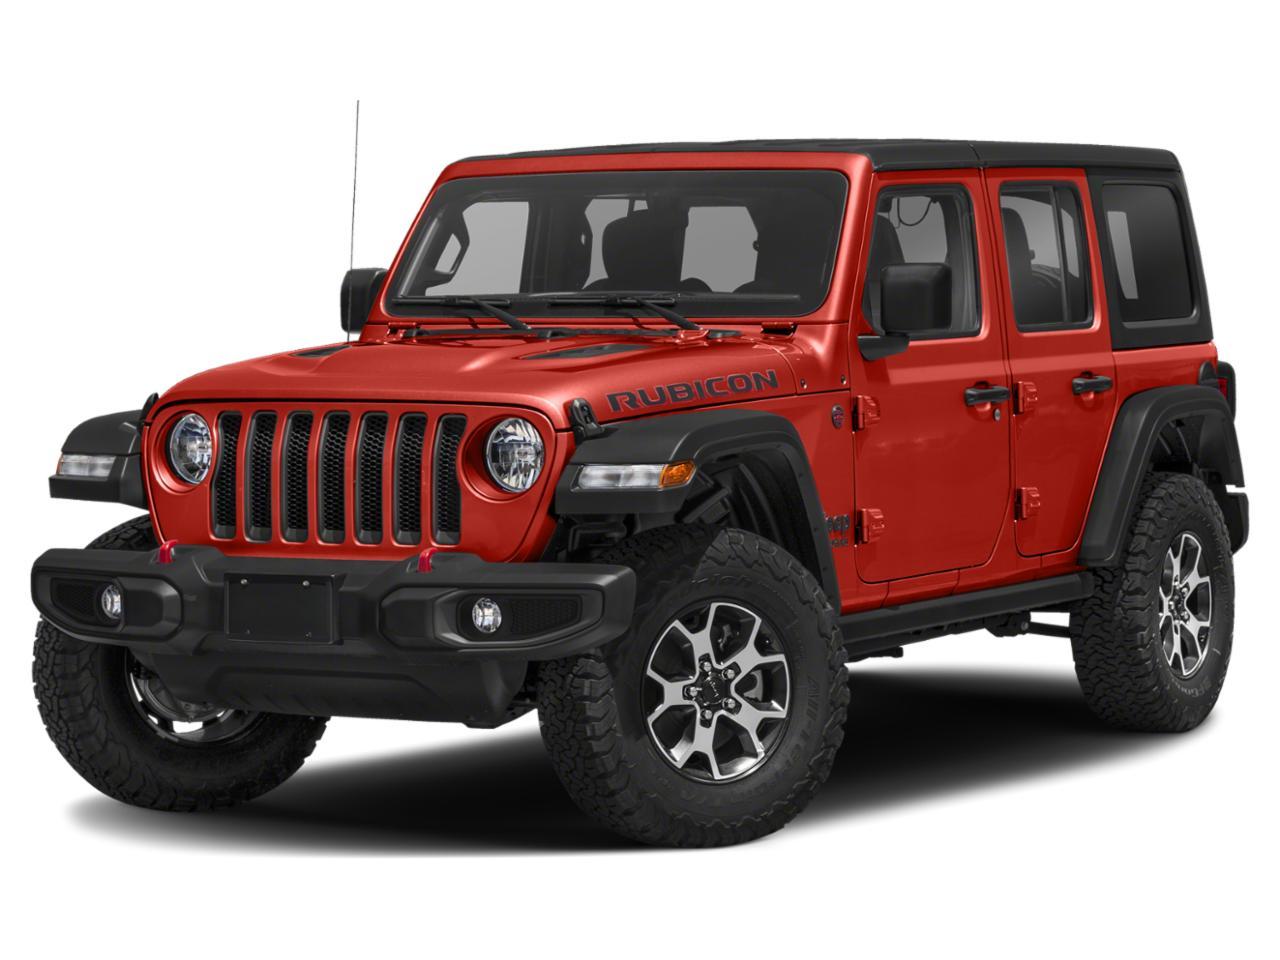 2020 Jeep Wrangler Unlimited Vehicle Photo in Tucson, AZ 85705